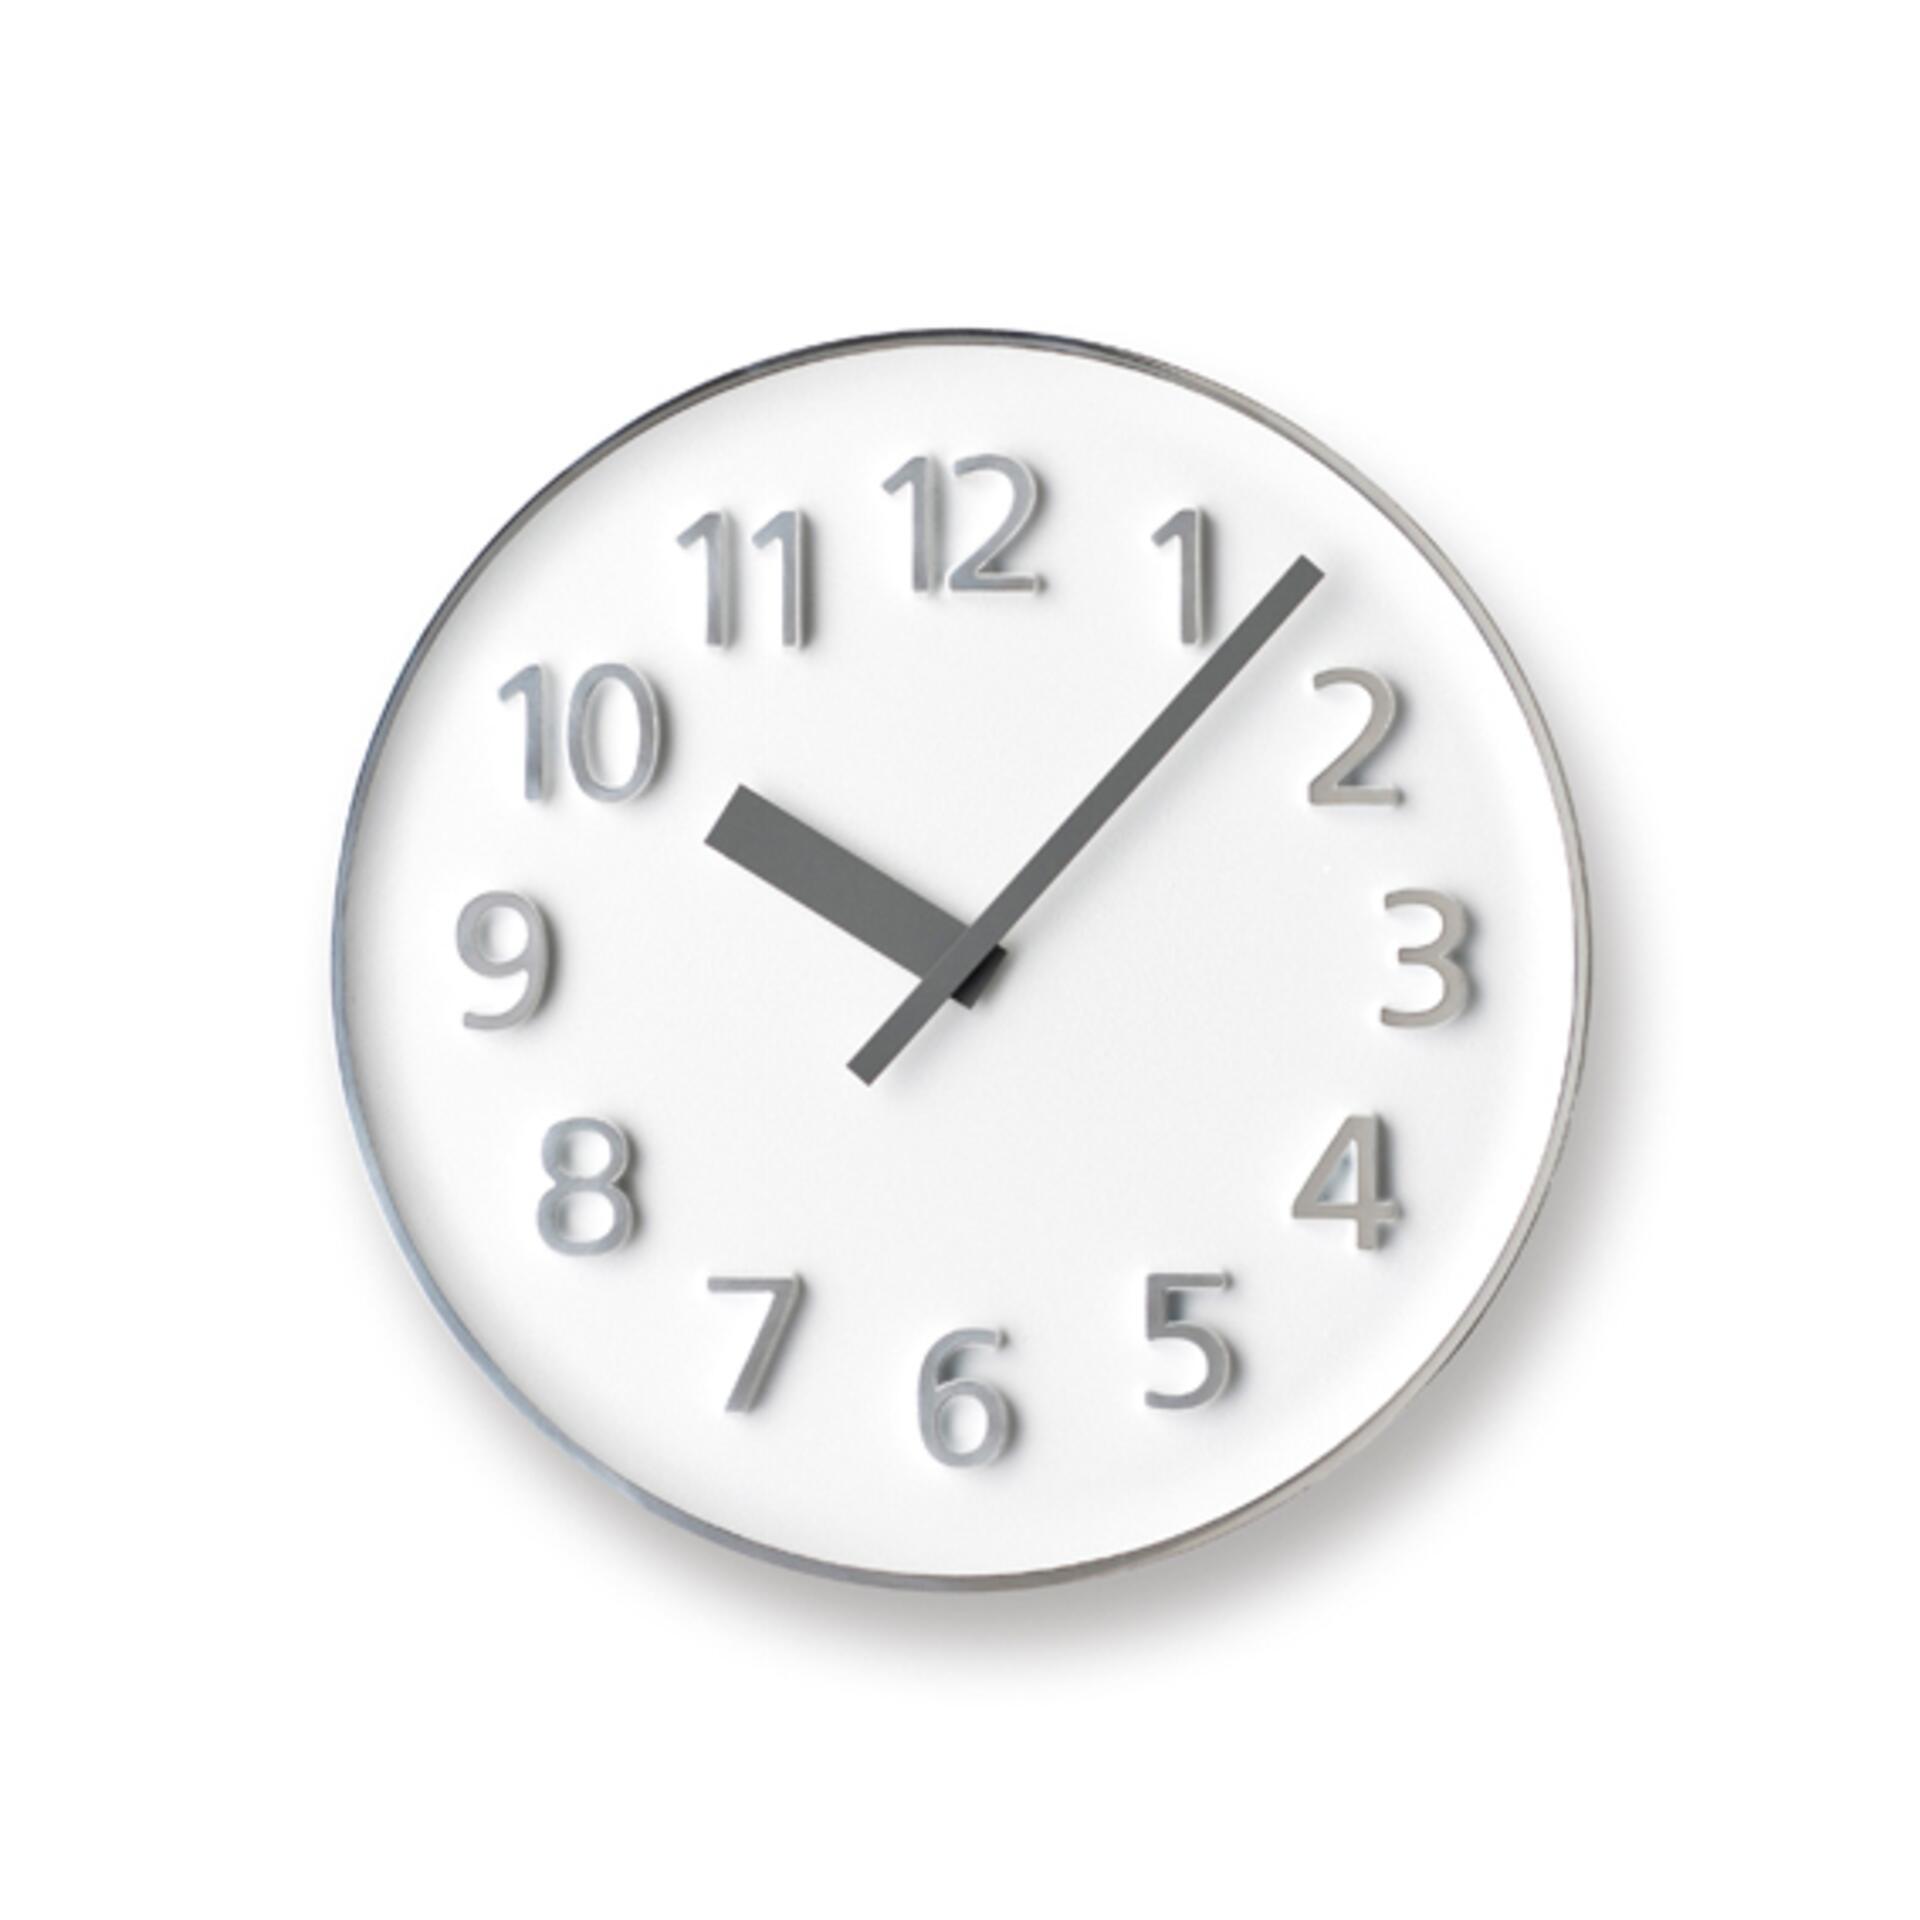 Lemnos Founder Clock Wanduhr Weiß